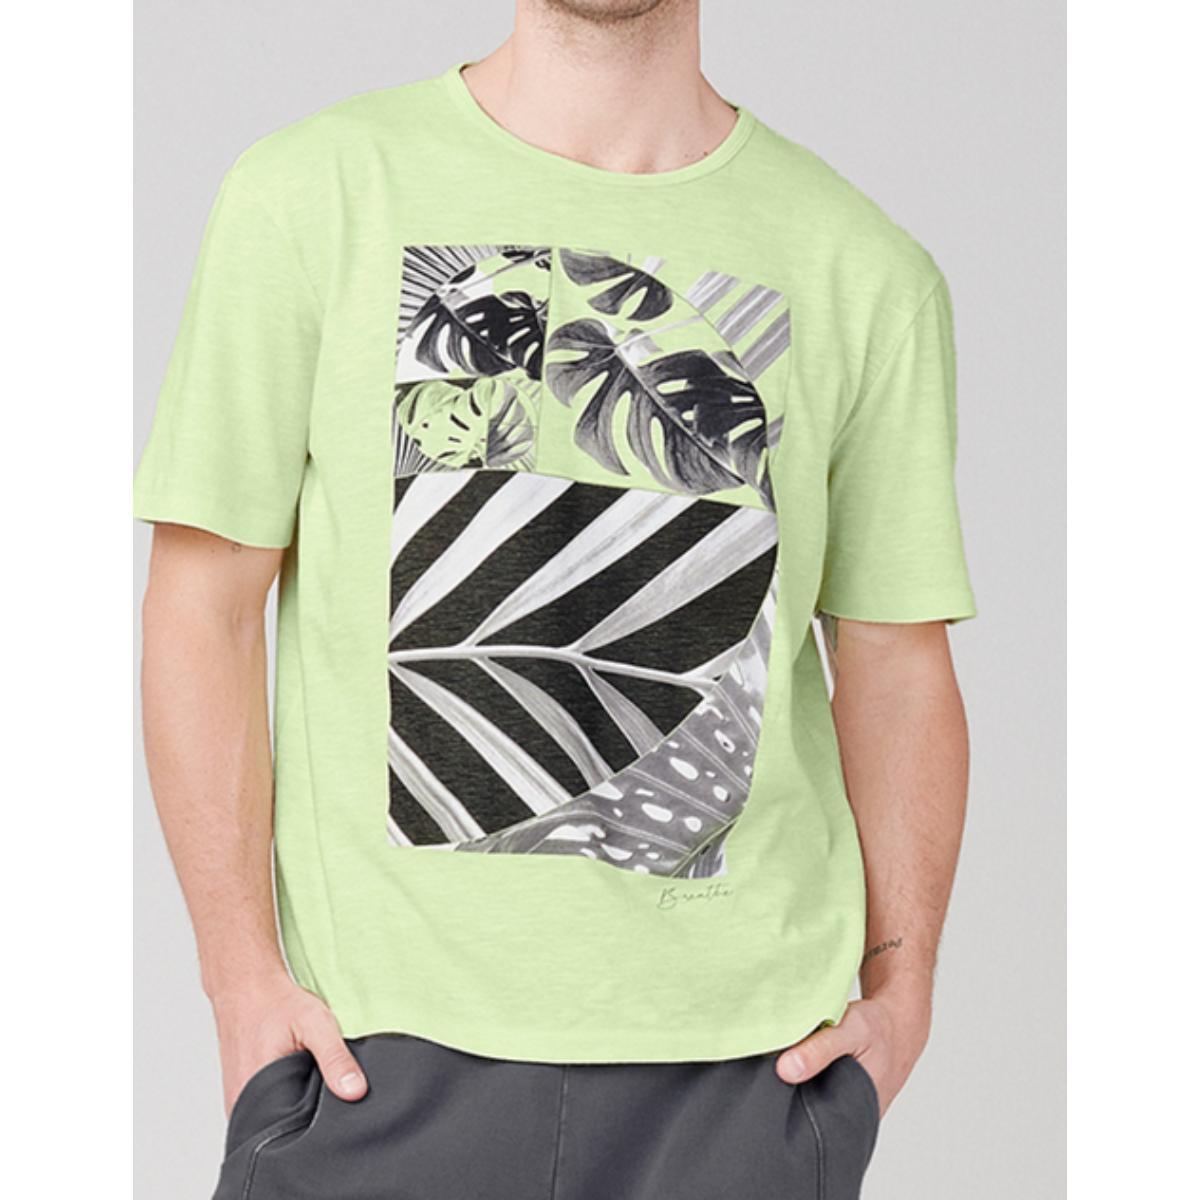 Camiseta Masculina Dzarm 6r8b Wb8en Verde Claro